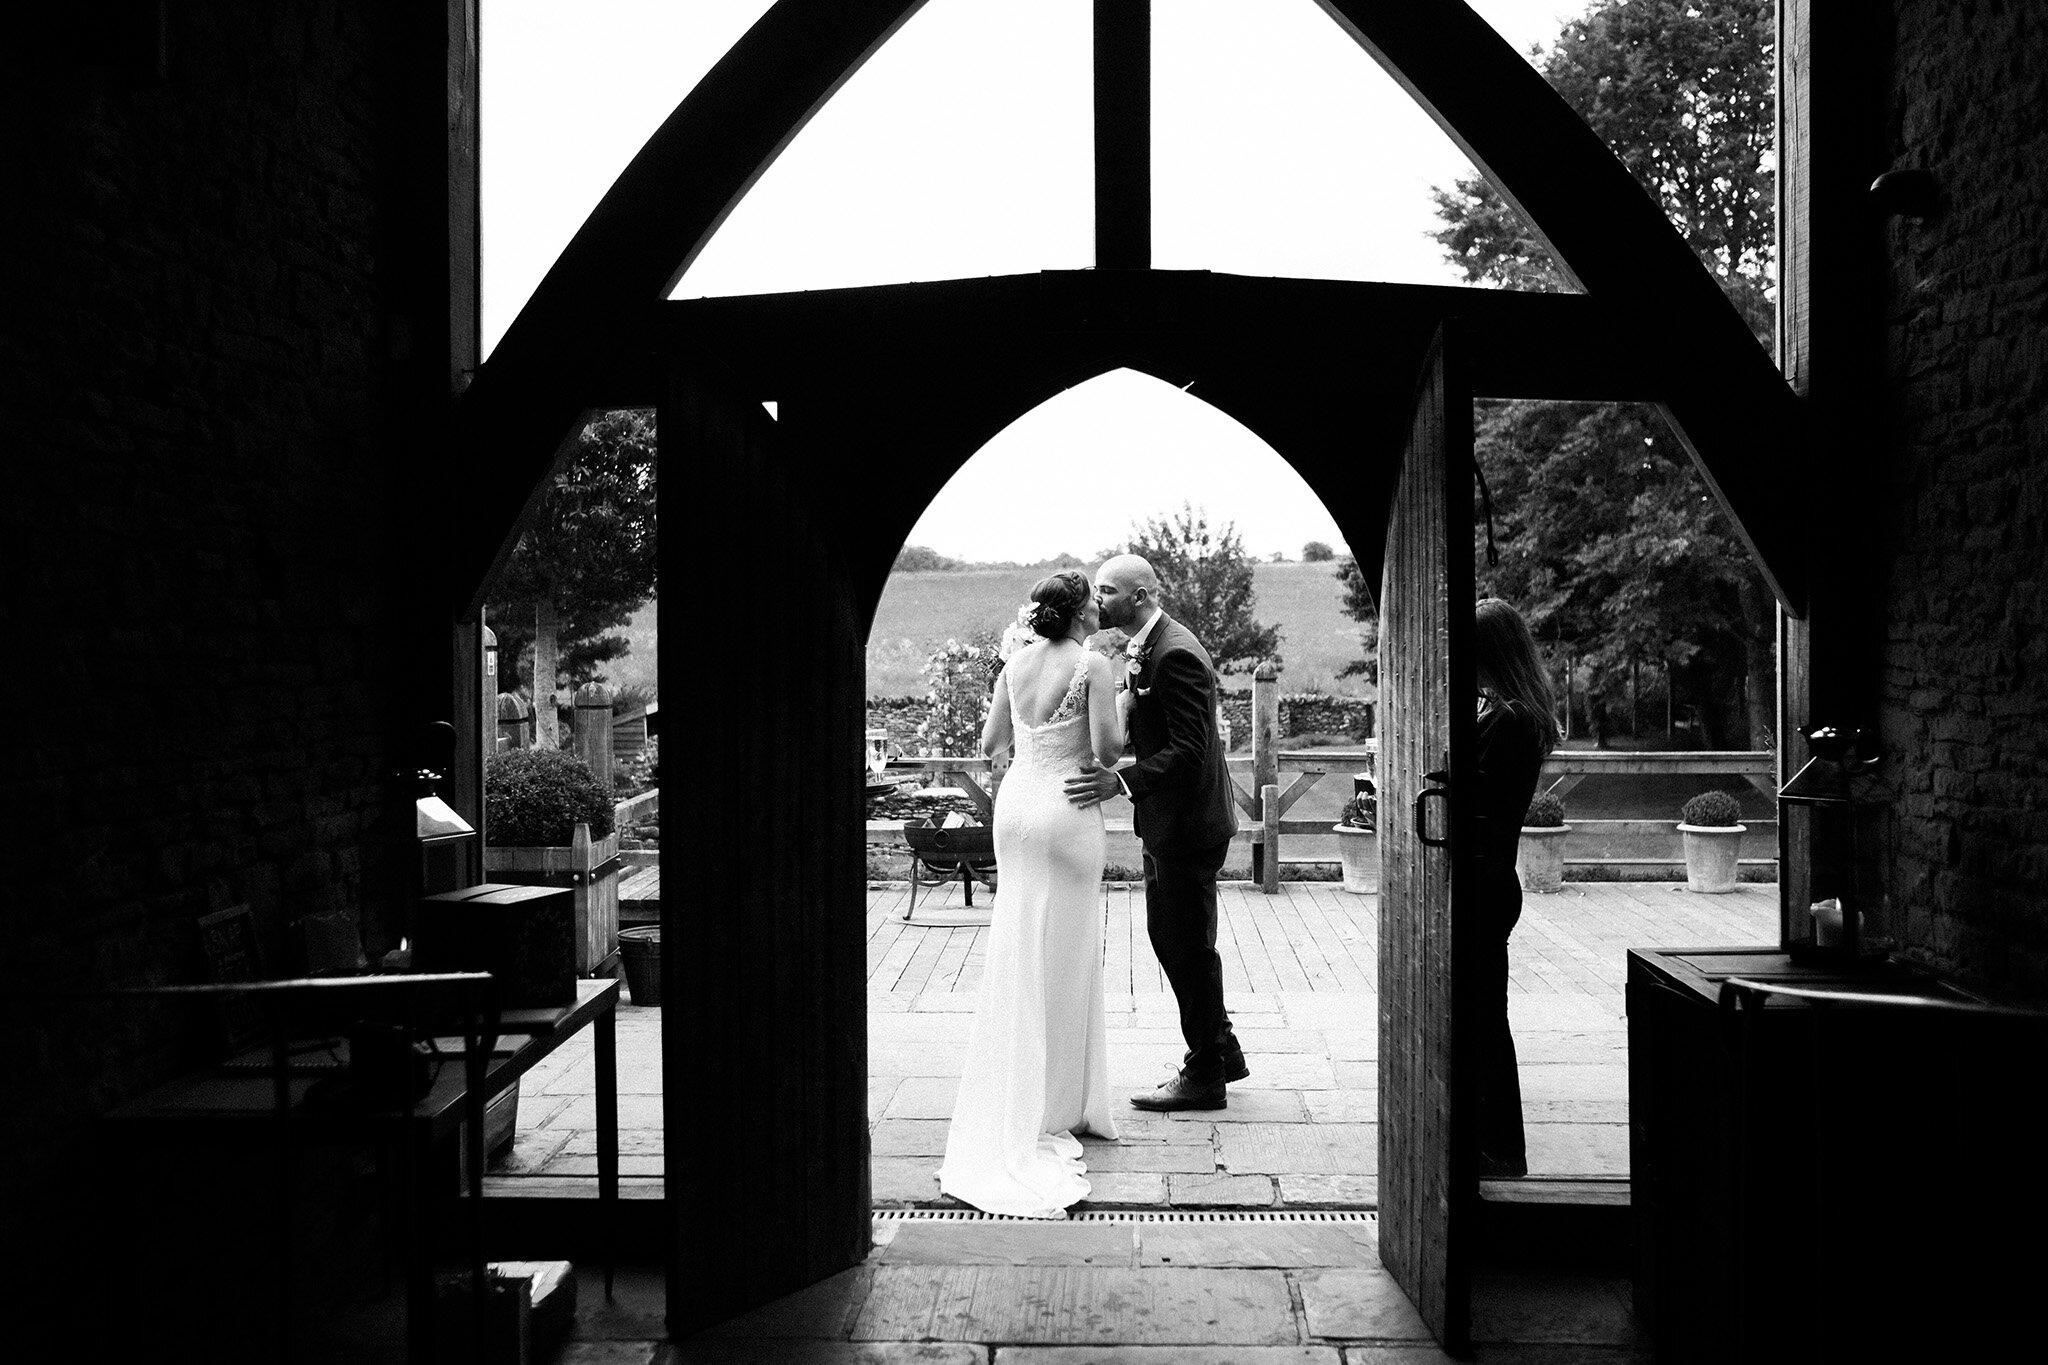 Scott-Stockwell-Photography-wedding-photographer-cripps-barn-kiss.jpg